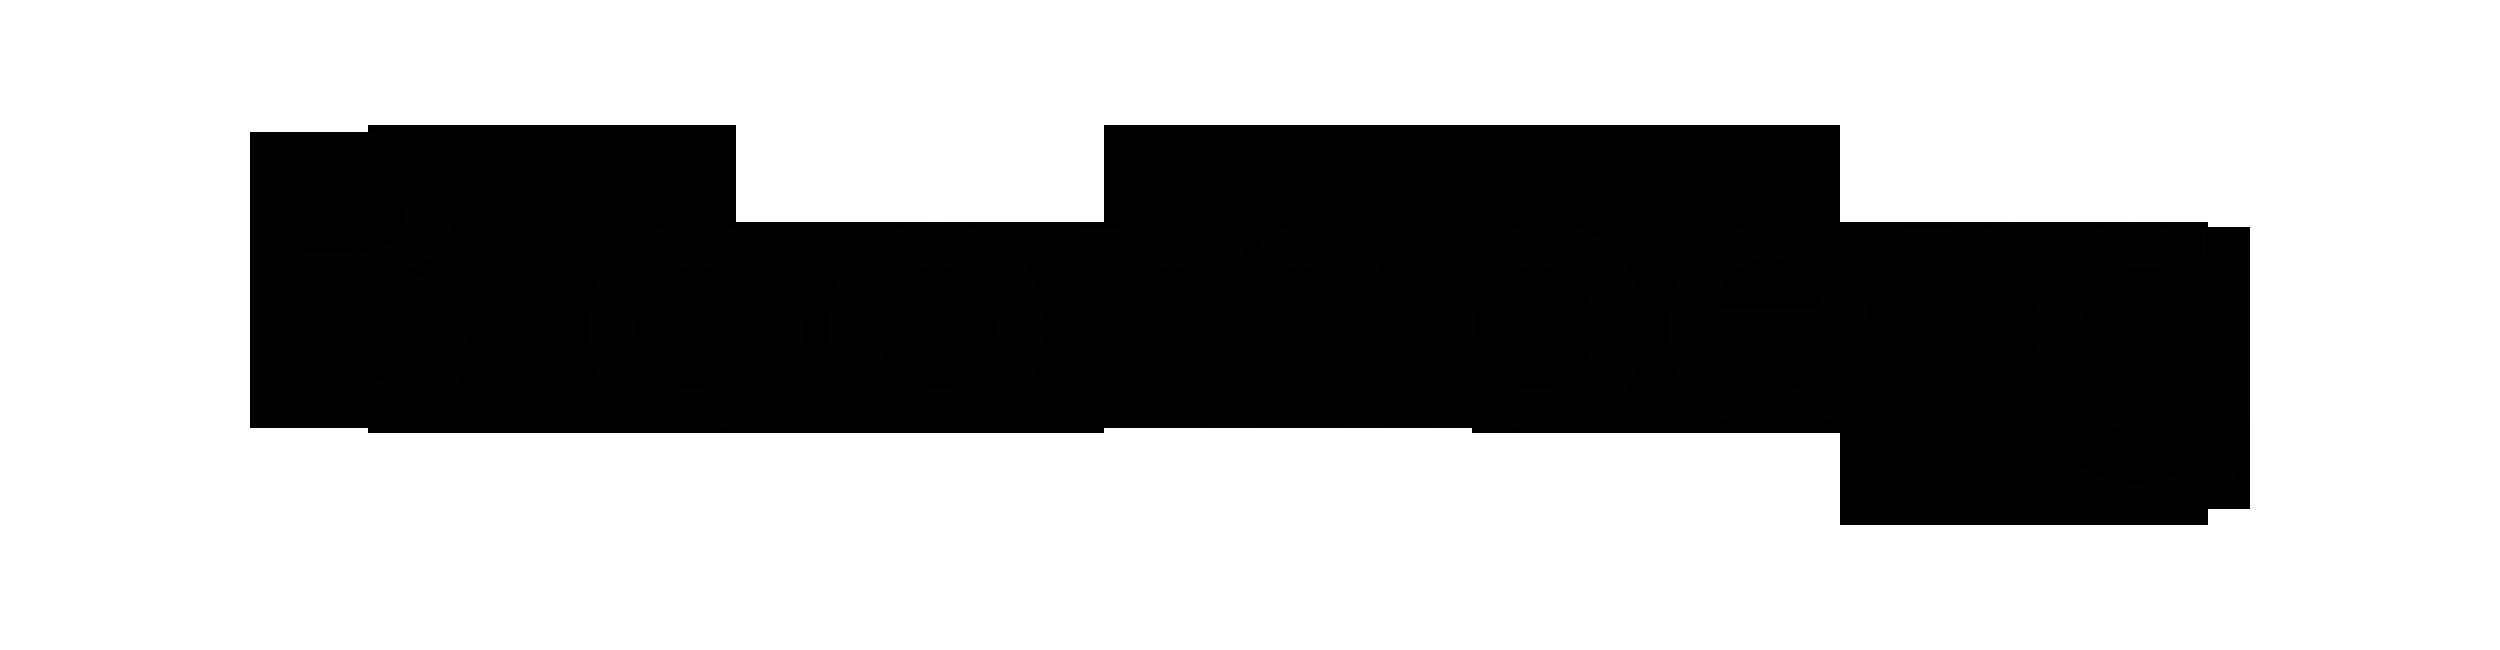 bloomberg-logo1